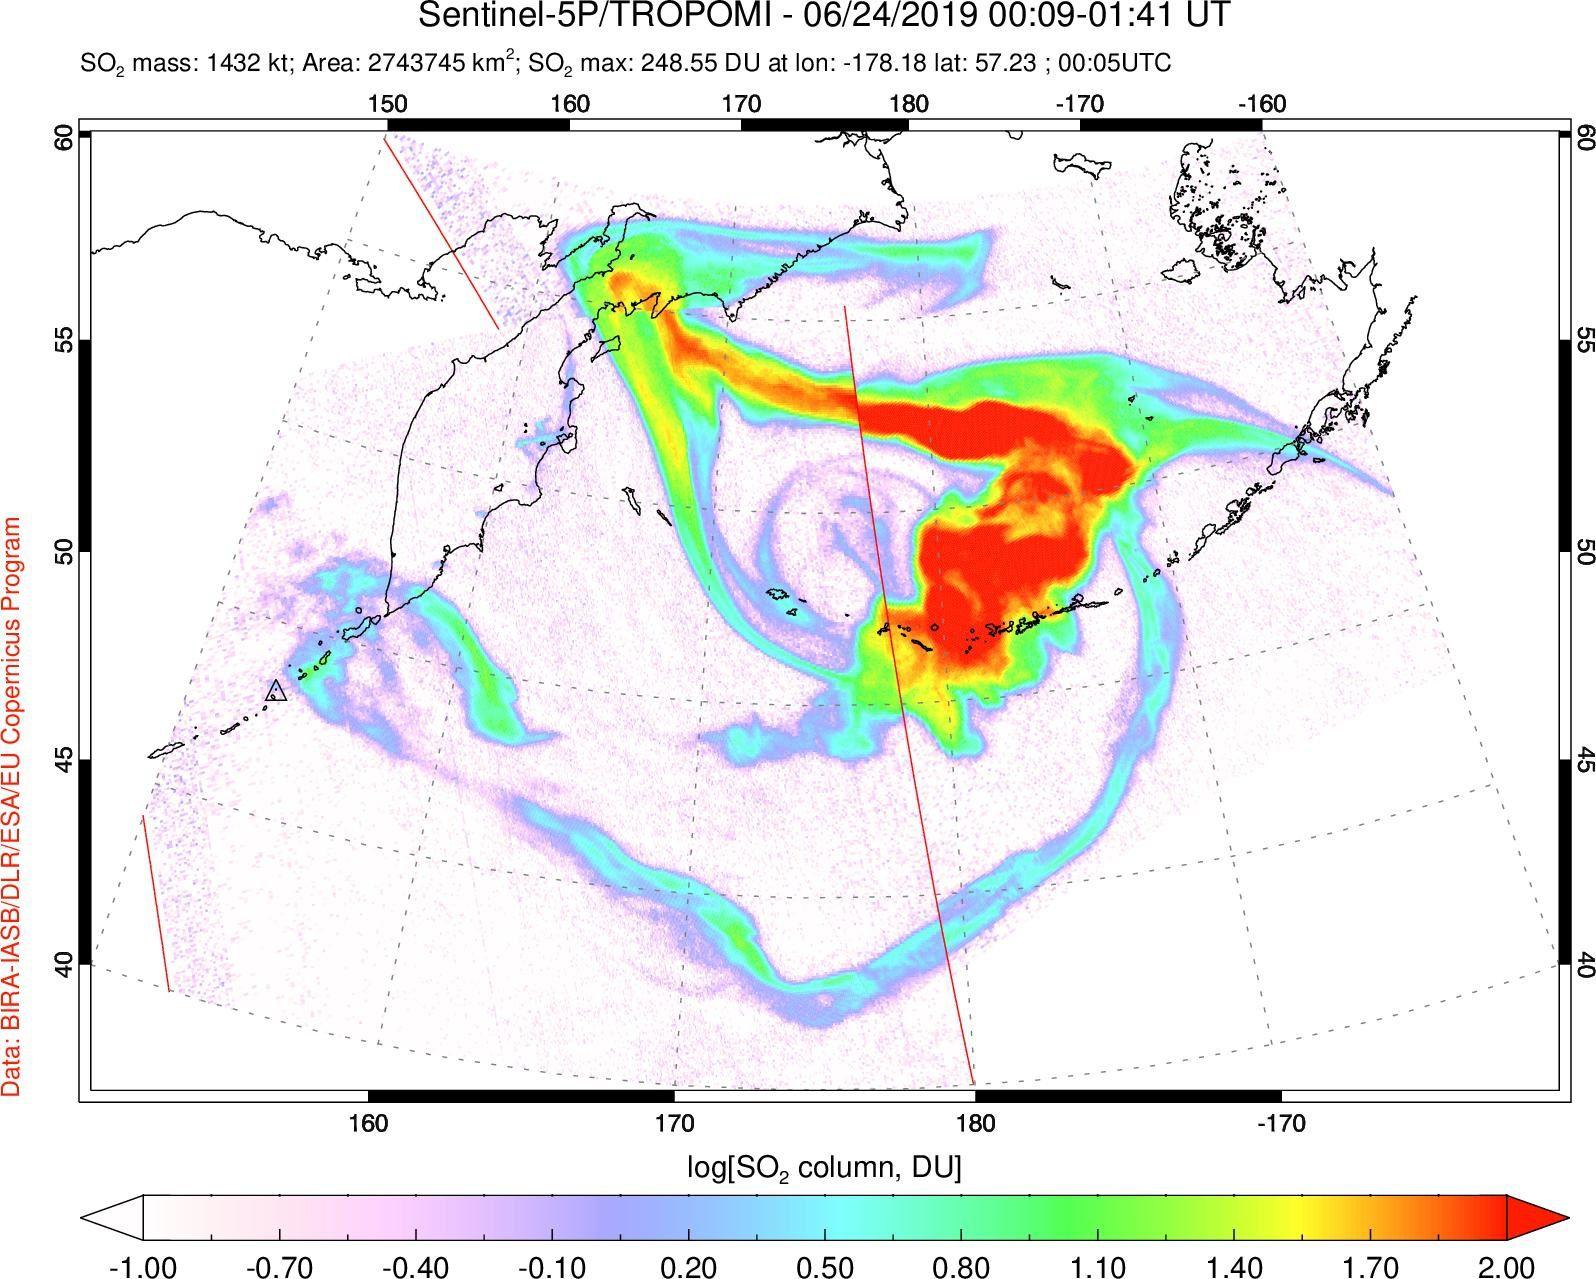 Raikoke - Cloud of Sulfur Dioxide - Doc. Sentinel 5P Tropomi 24.06.2019 / 0h09 - 01h41 GMT - via S.Carn